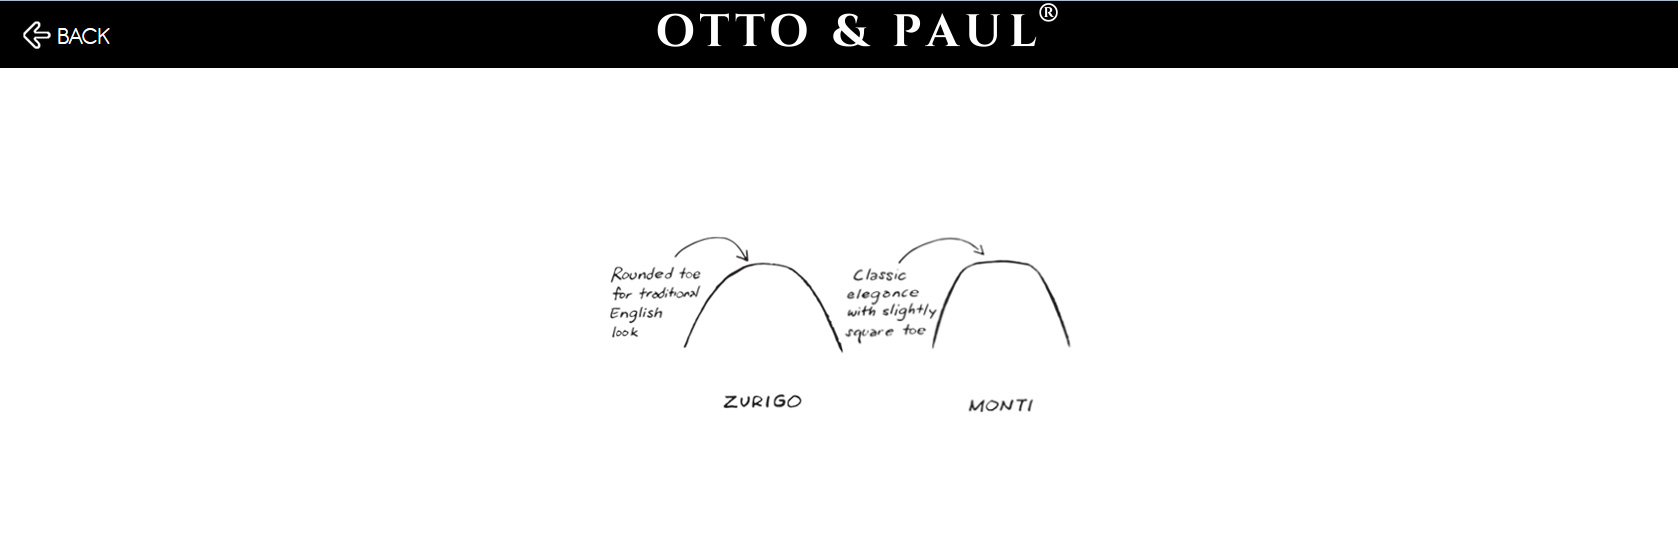 Otto & Paul - Auswahl der Schuhform